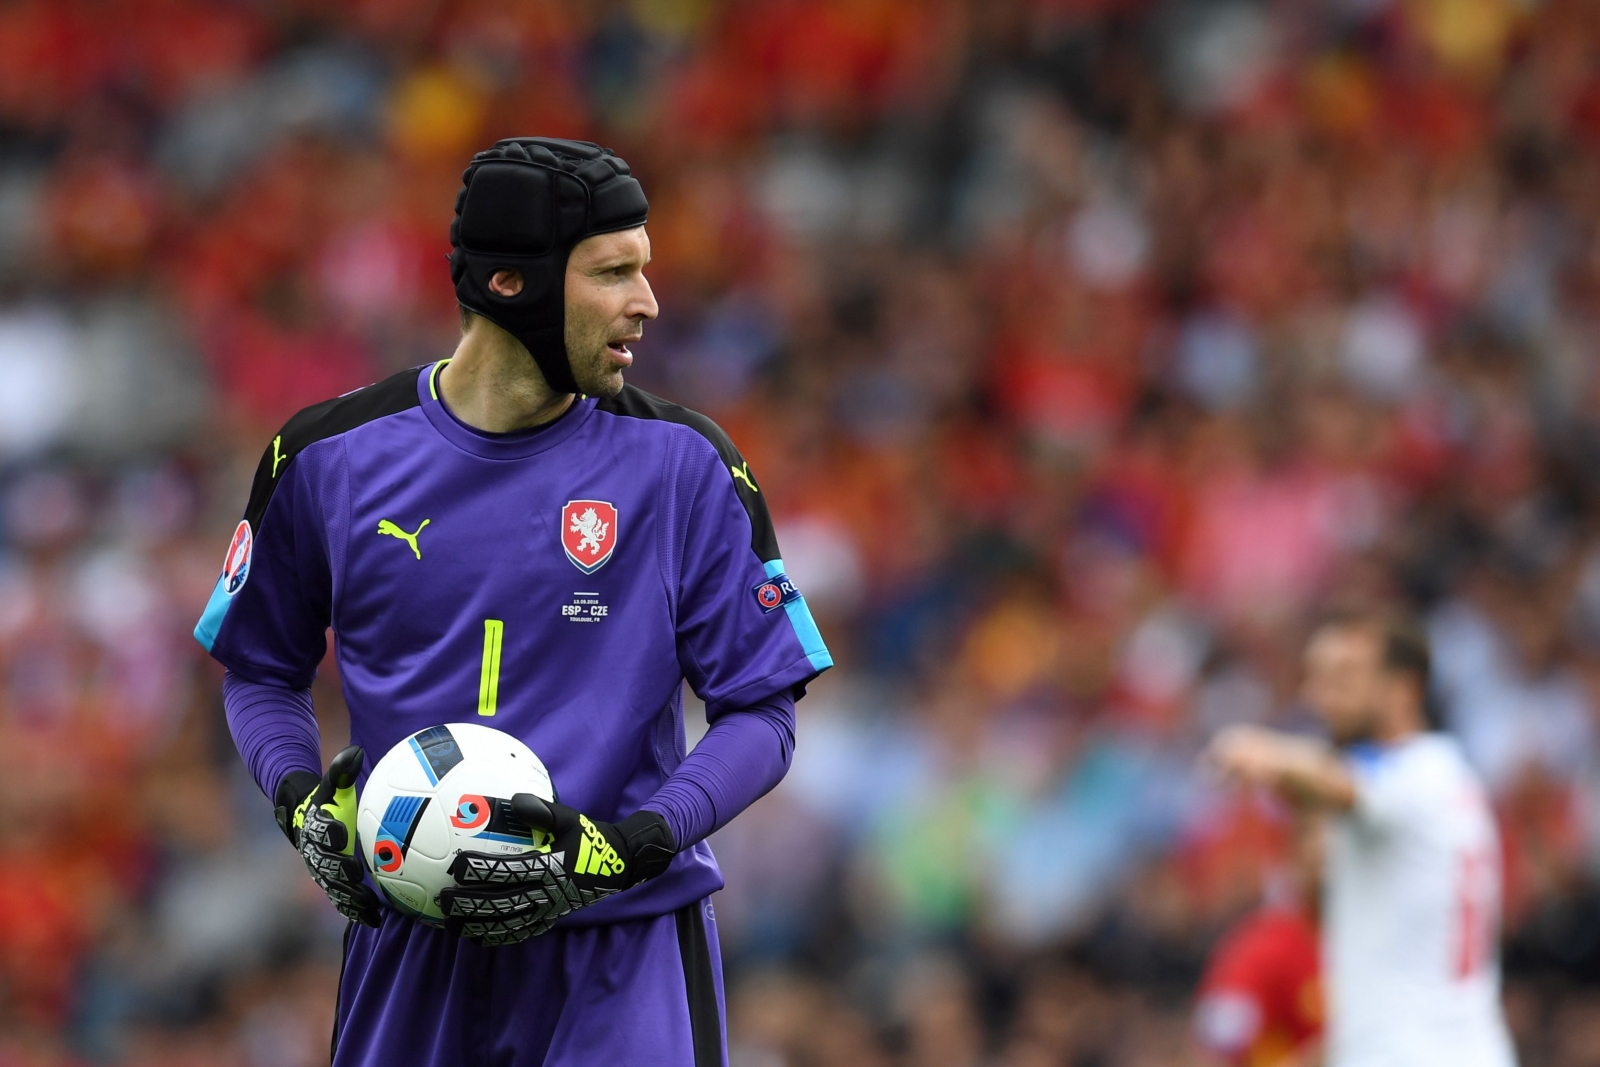 Petr Cech in net for the Czechs